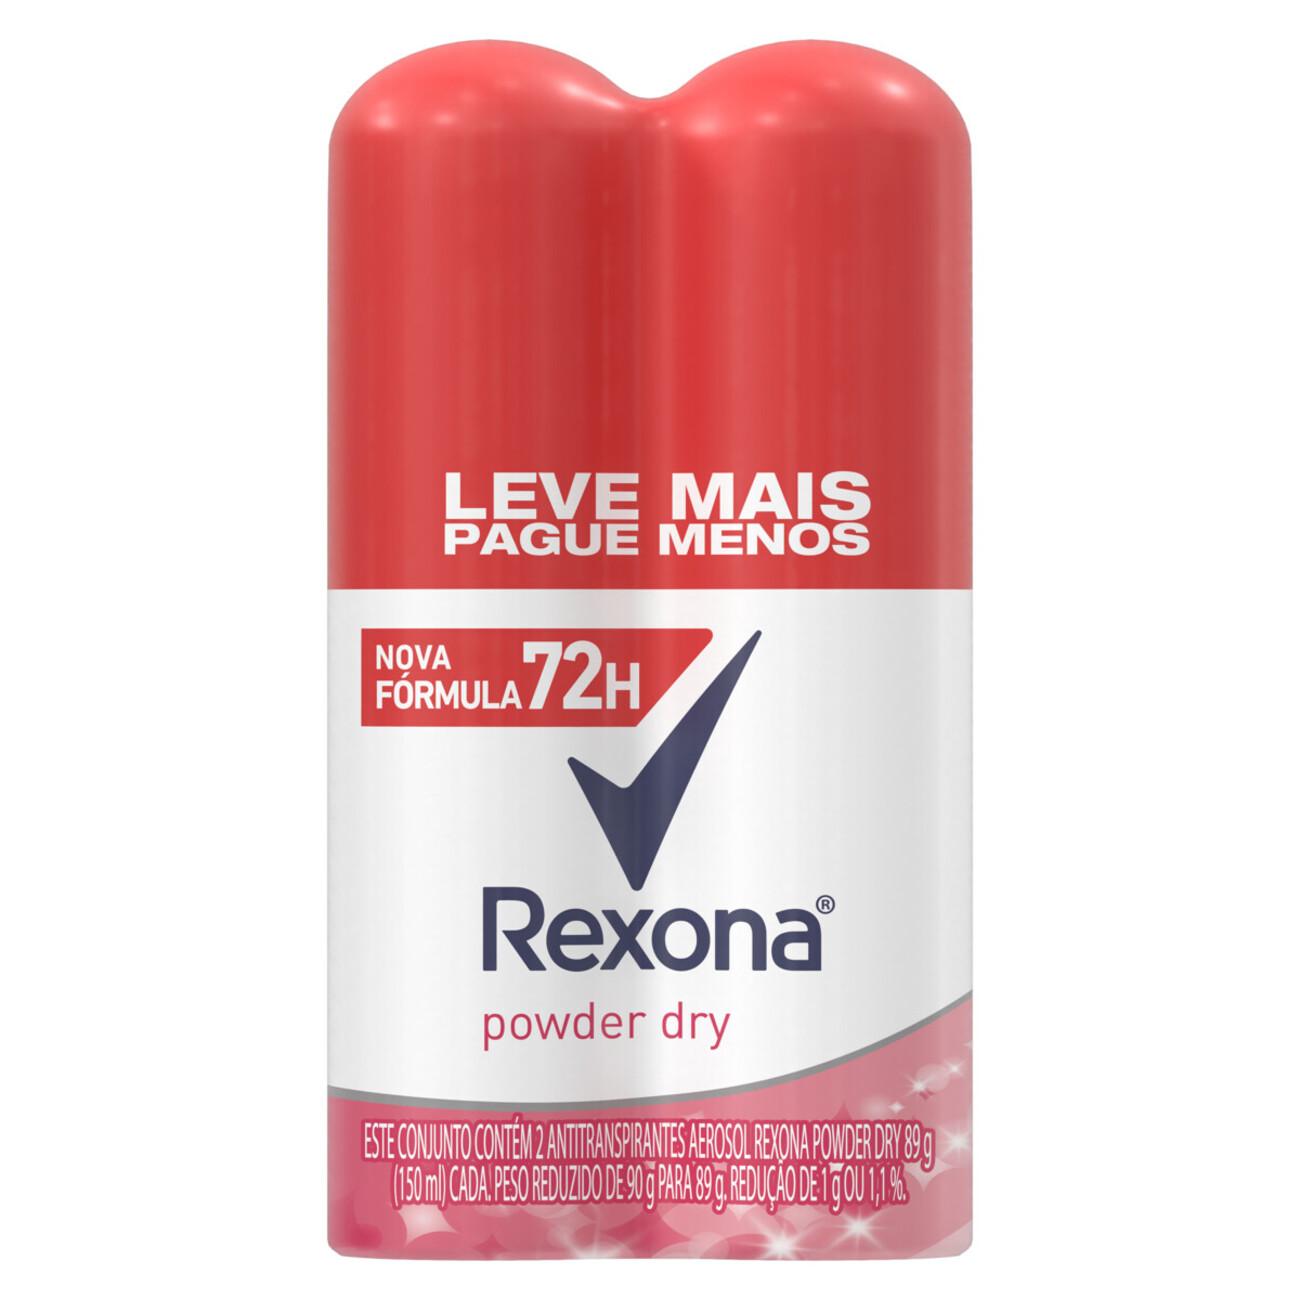 Oferta 2 Desodorantes Antitranspirante Rexona Feminino Aerosol Powder Dry 72 horas 150mL